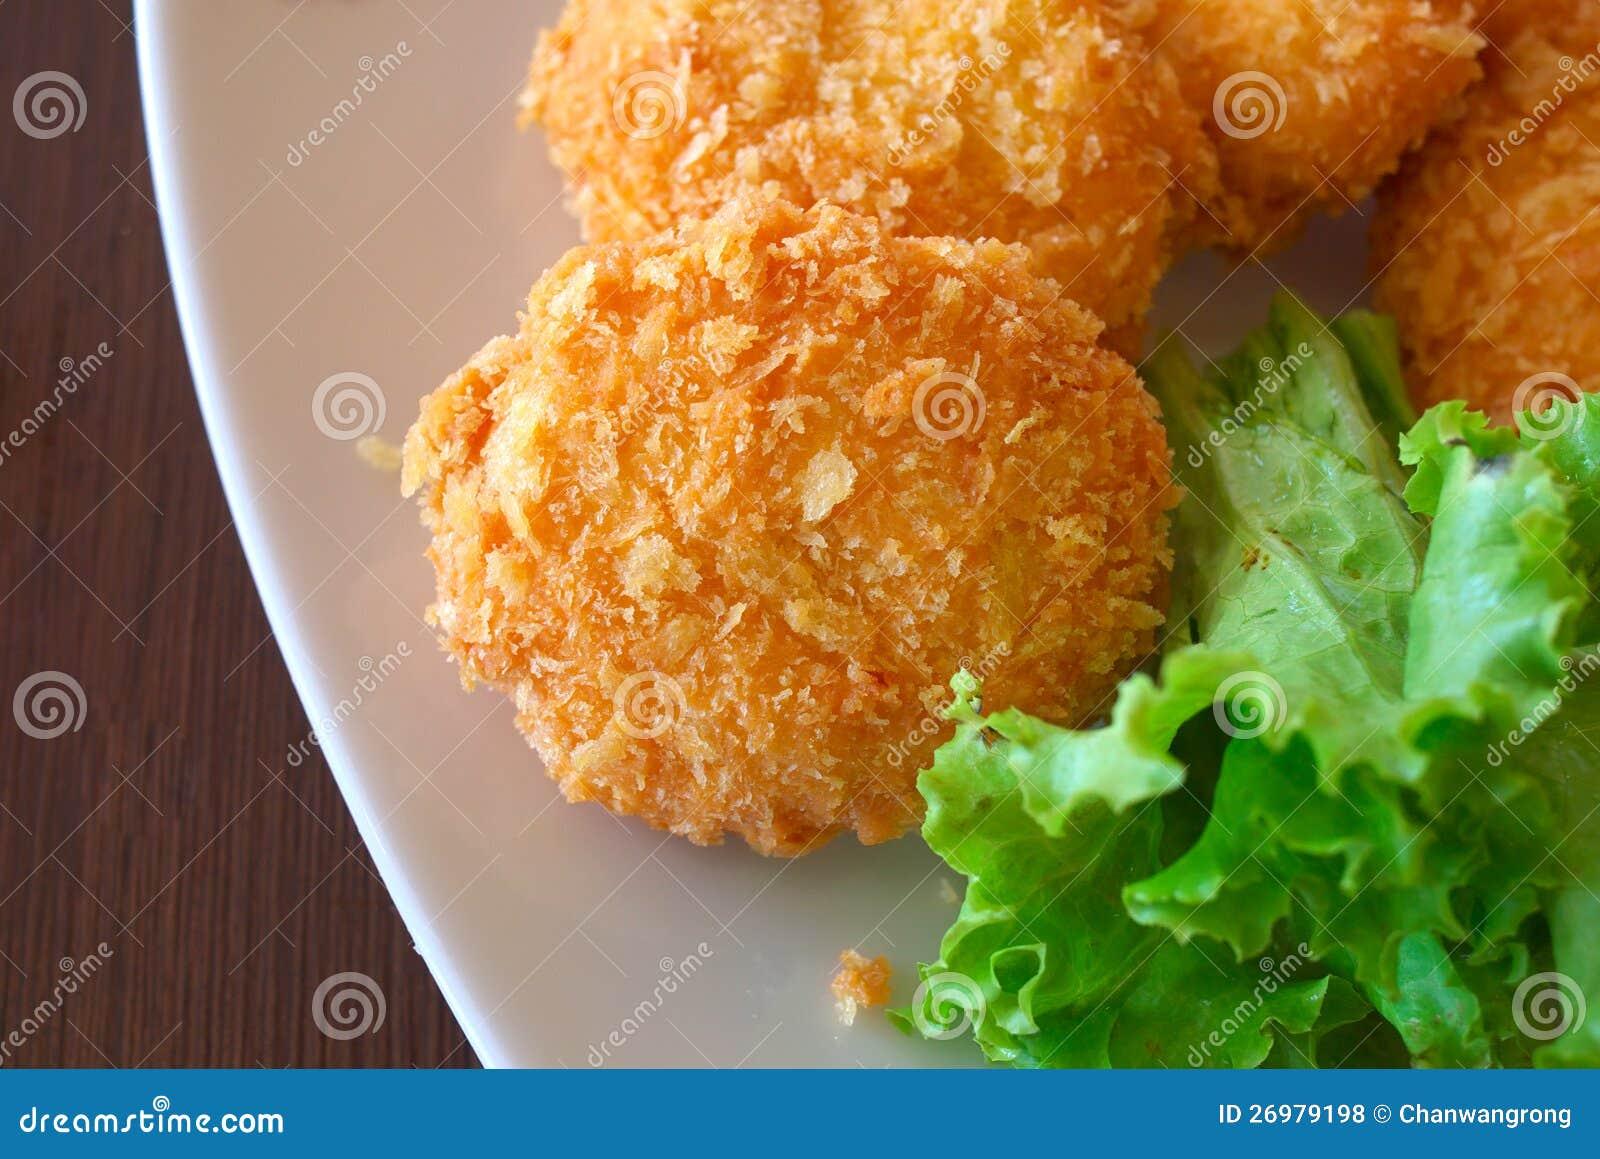 Deep-fried Shrimp Cakes Royalty Free Stock Photos - Image: 26979198